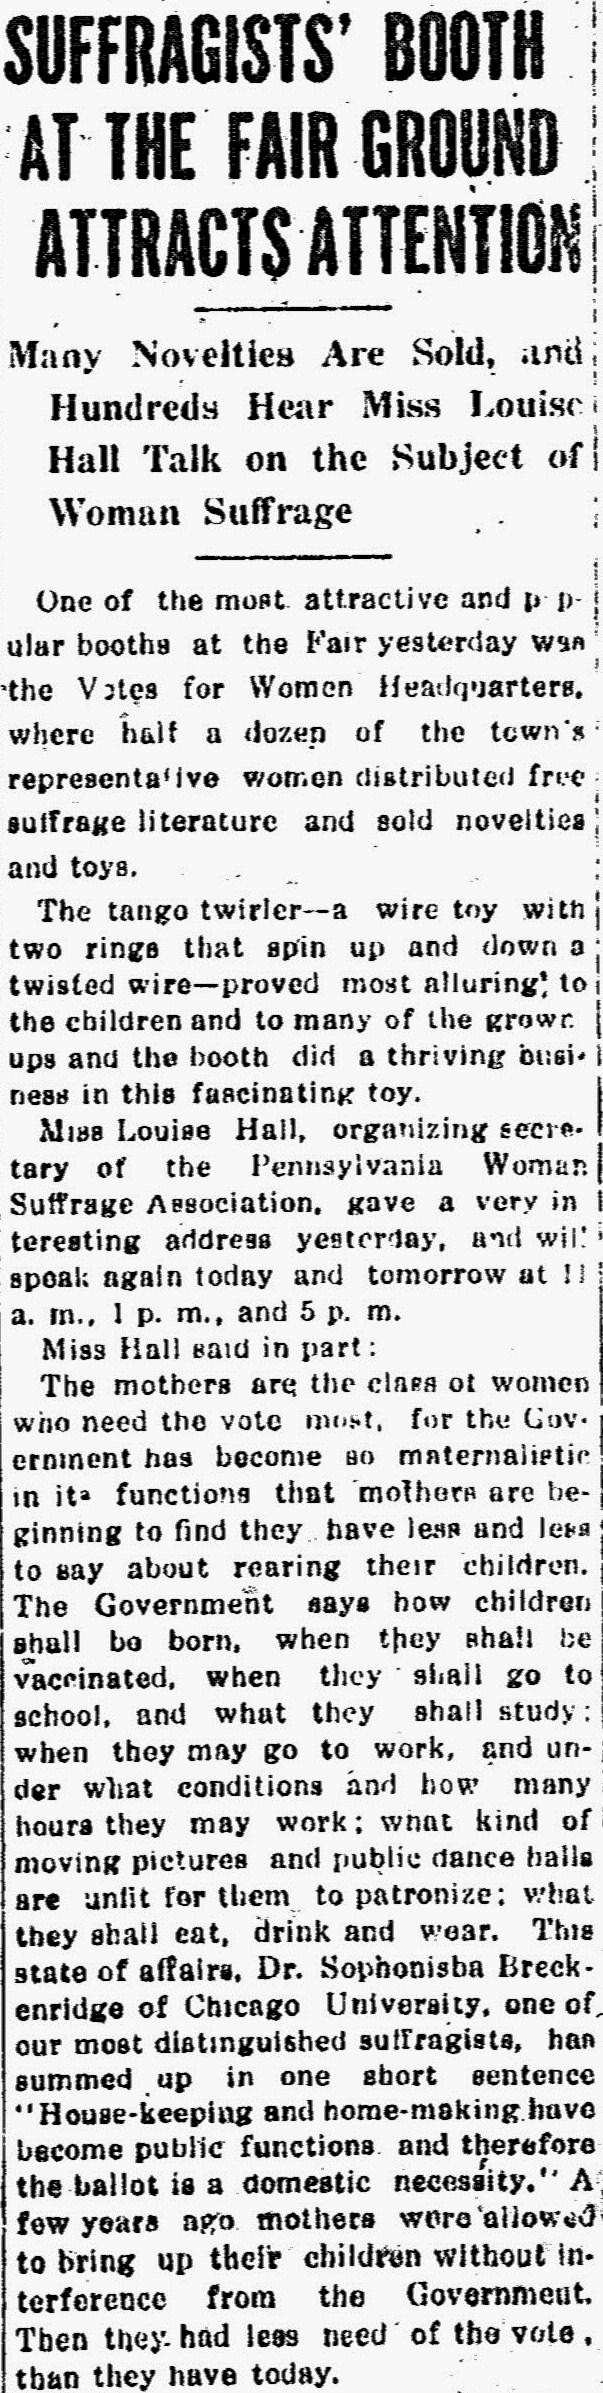 Source: Milton Evening Standard (October 1, 1914)